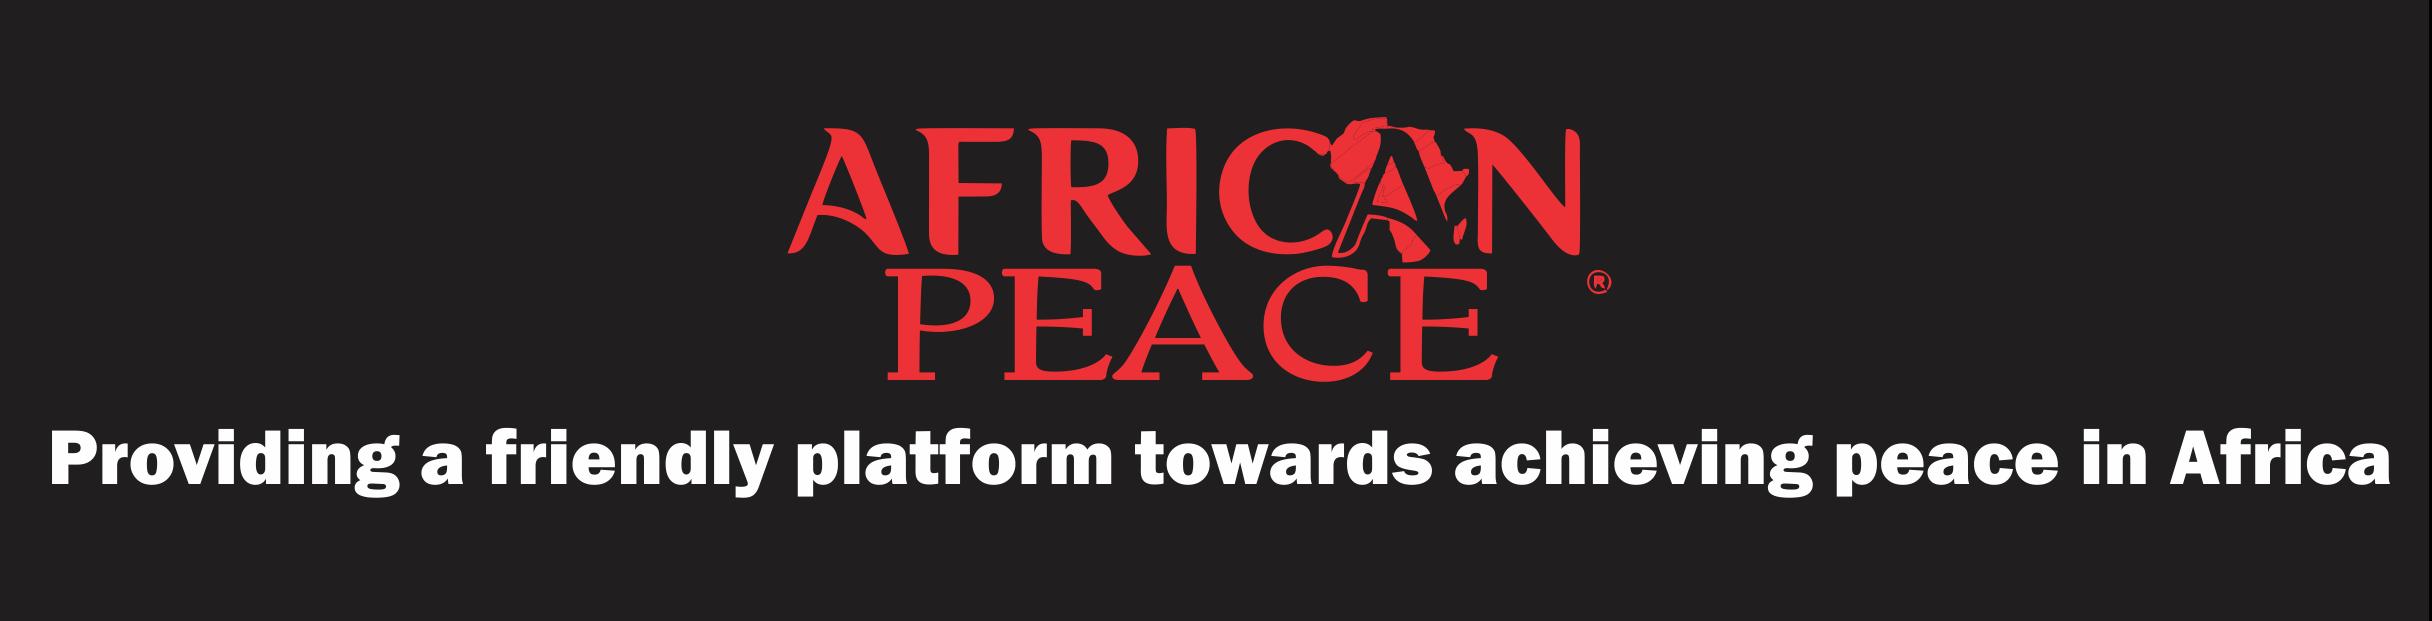 African Peace Magazine